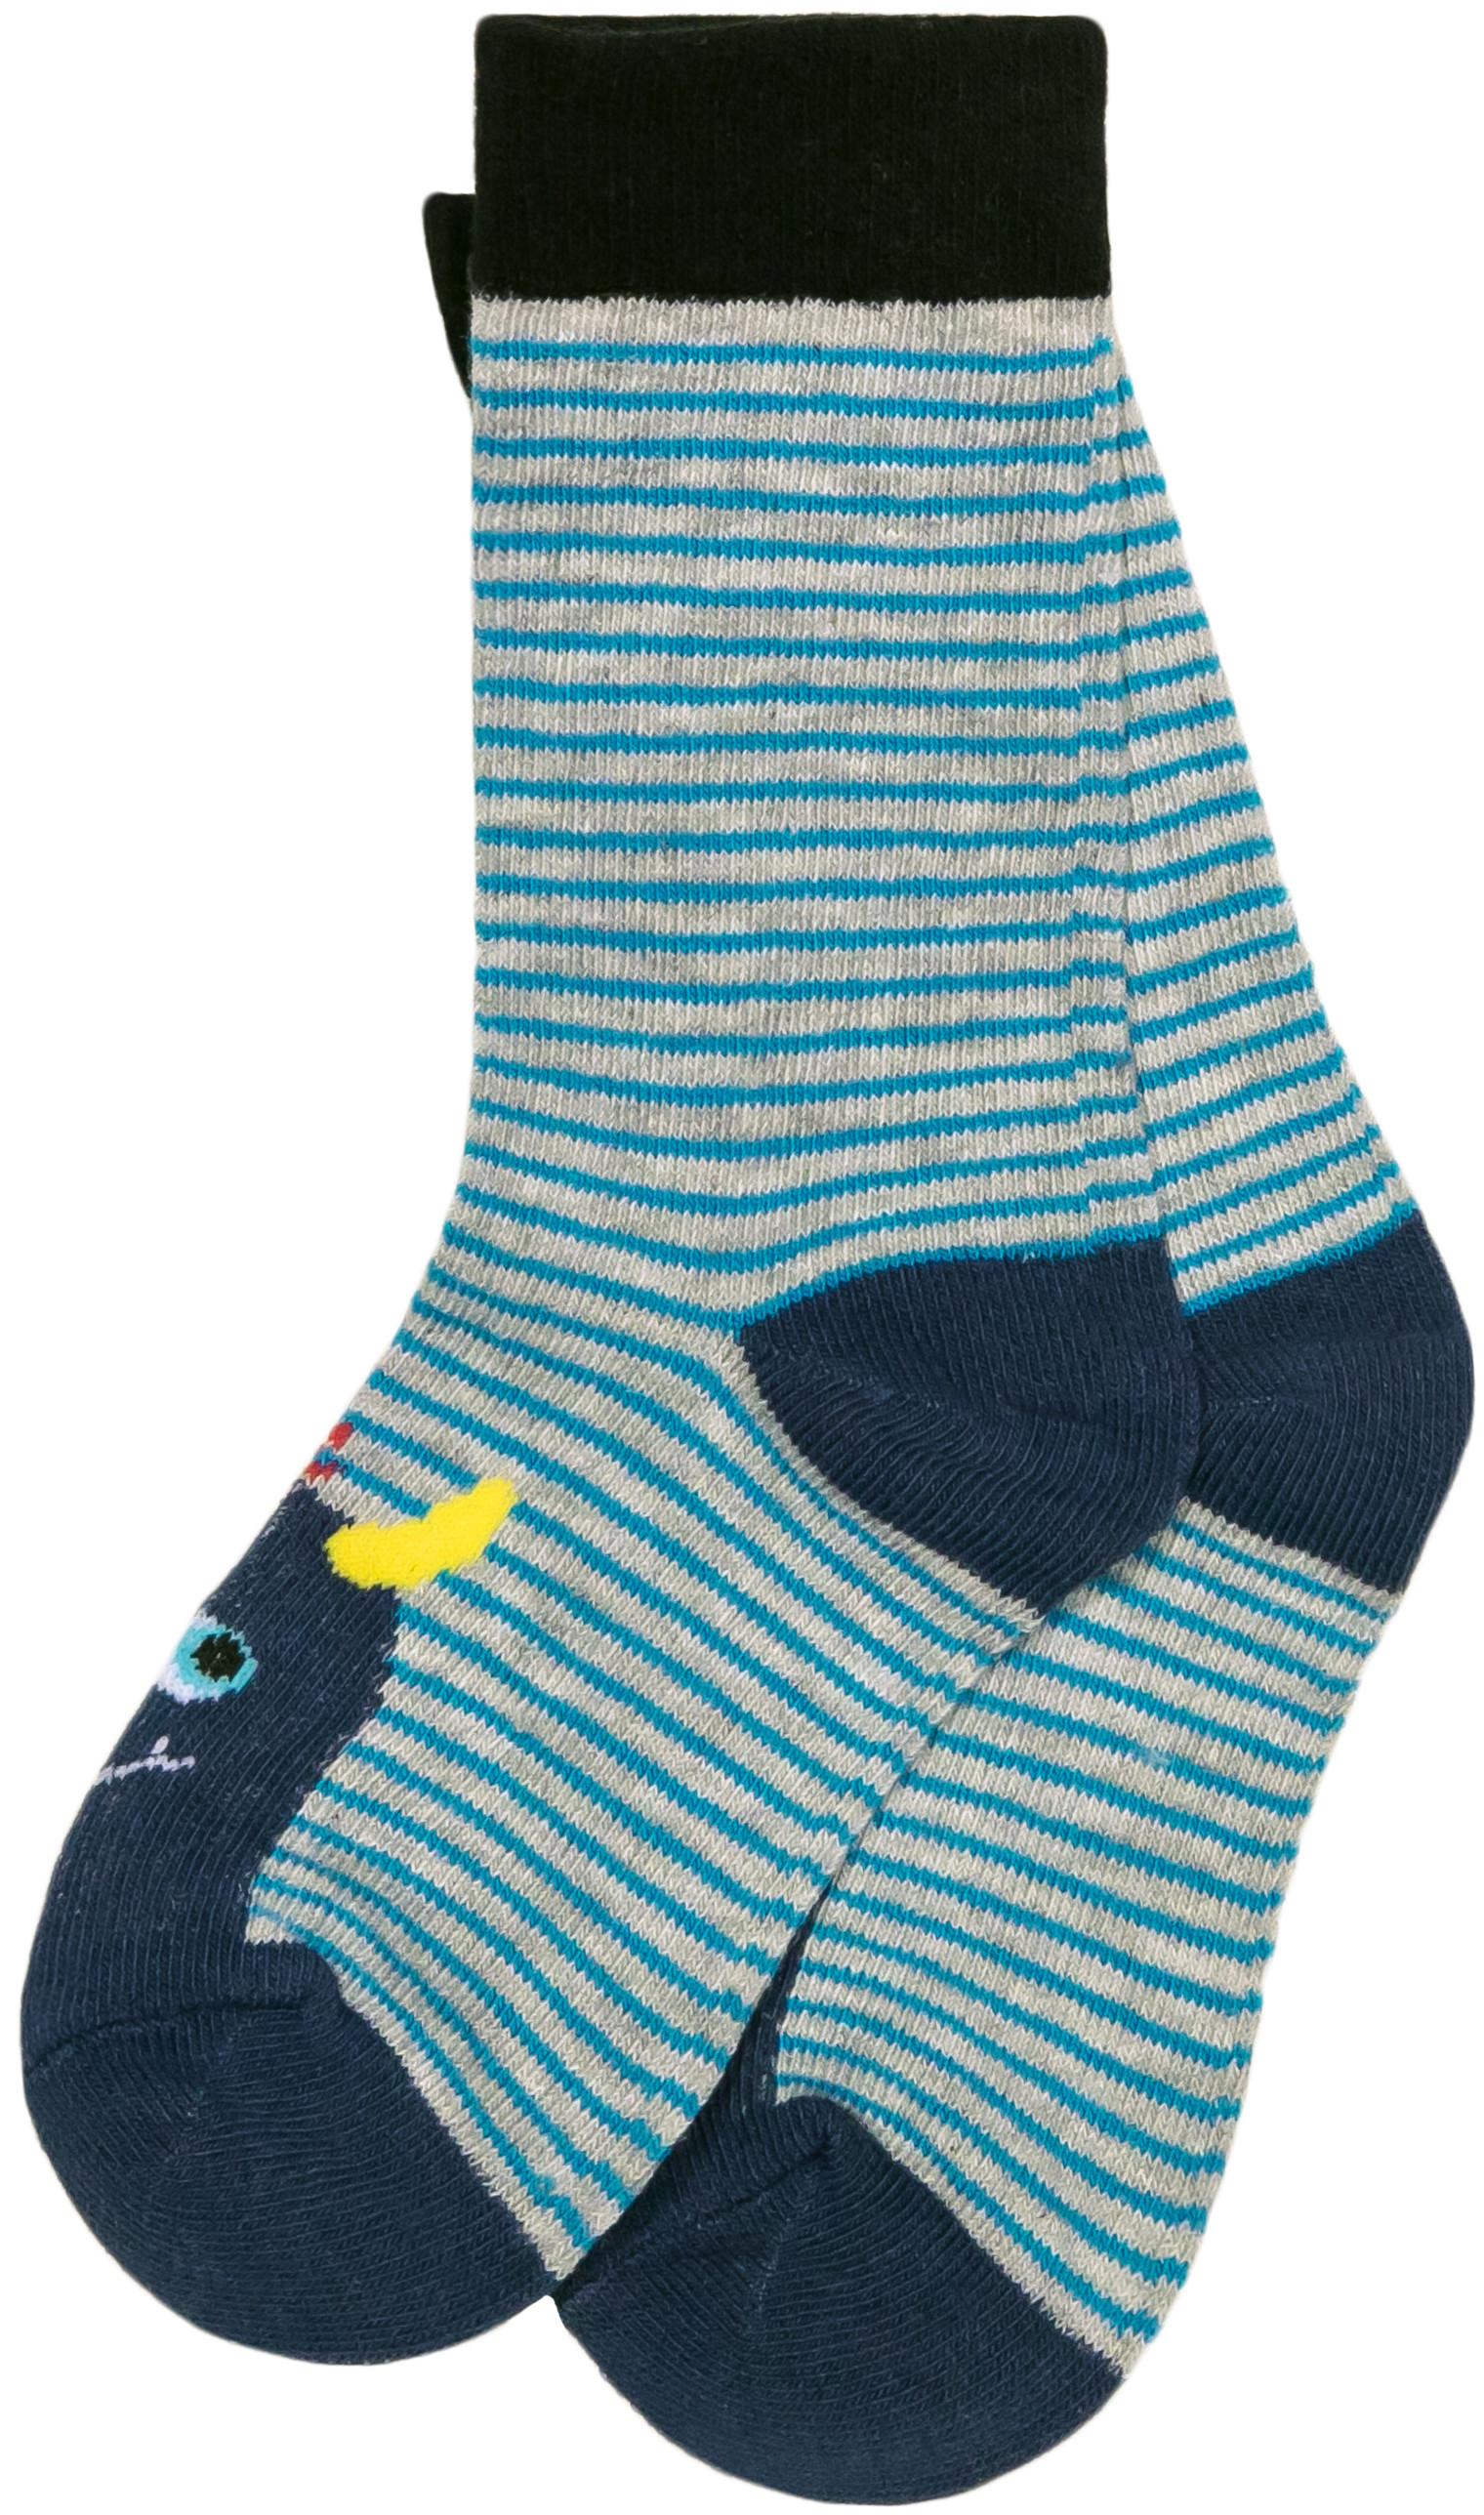 Носки Barkito S18B4004T носки barkito носки для мальчика комплект 3 пары barkito темно синие серые темно синие с рисунком в полоску